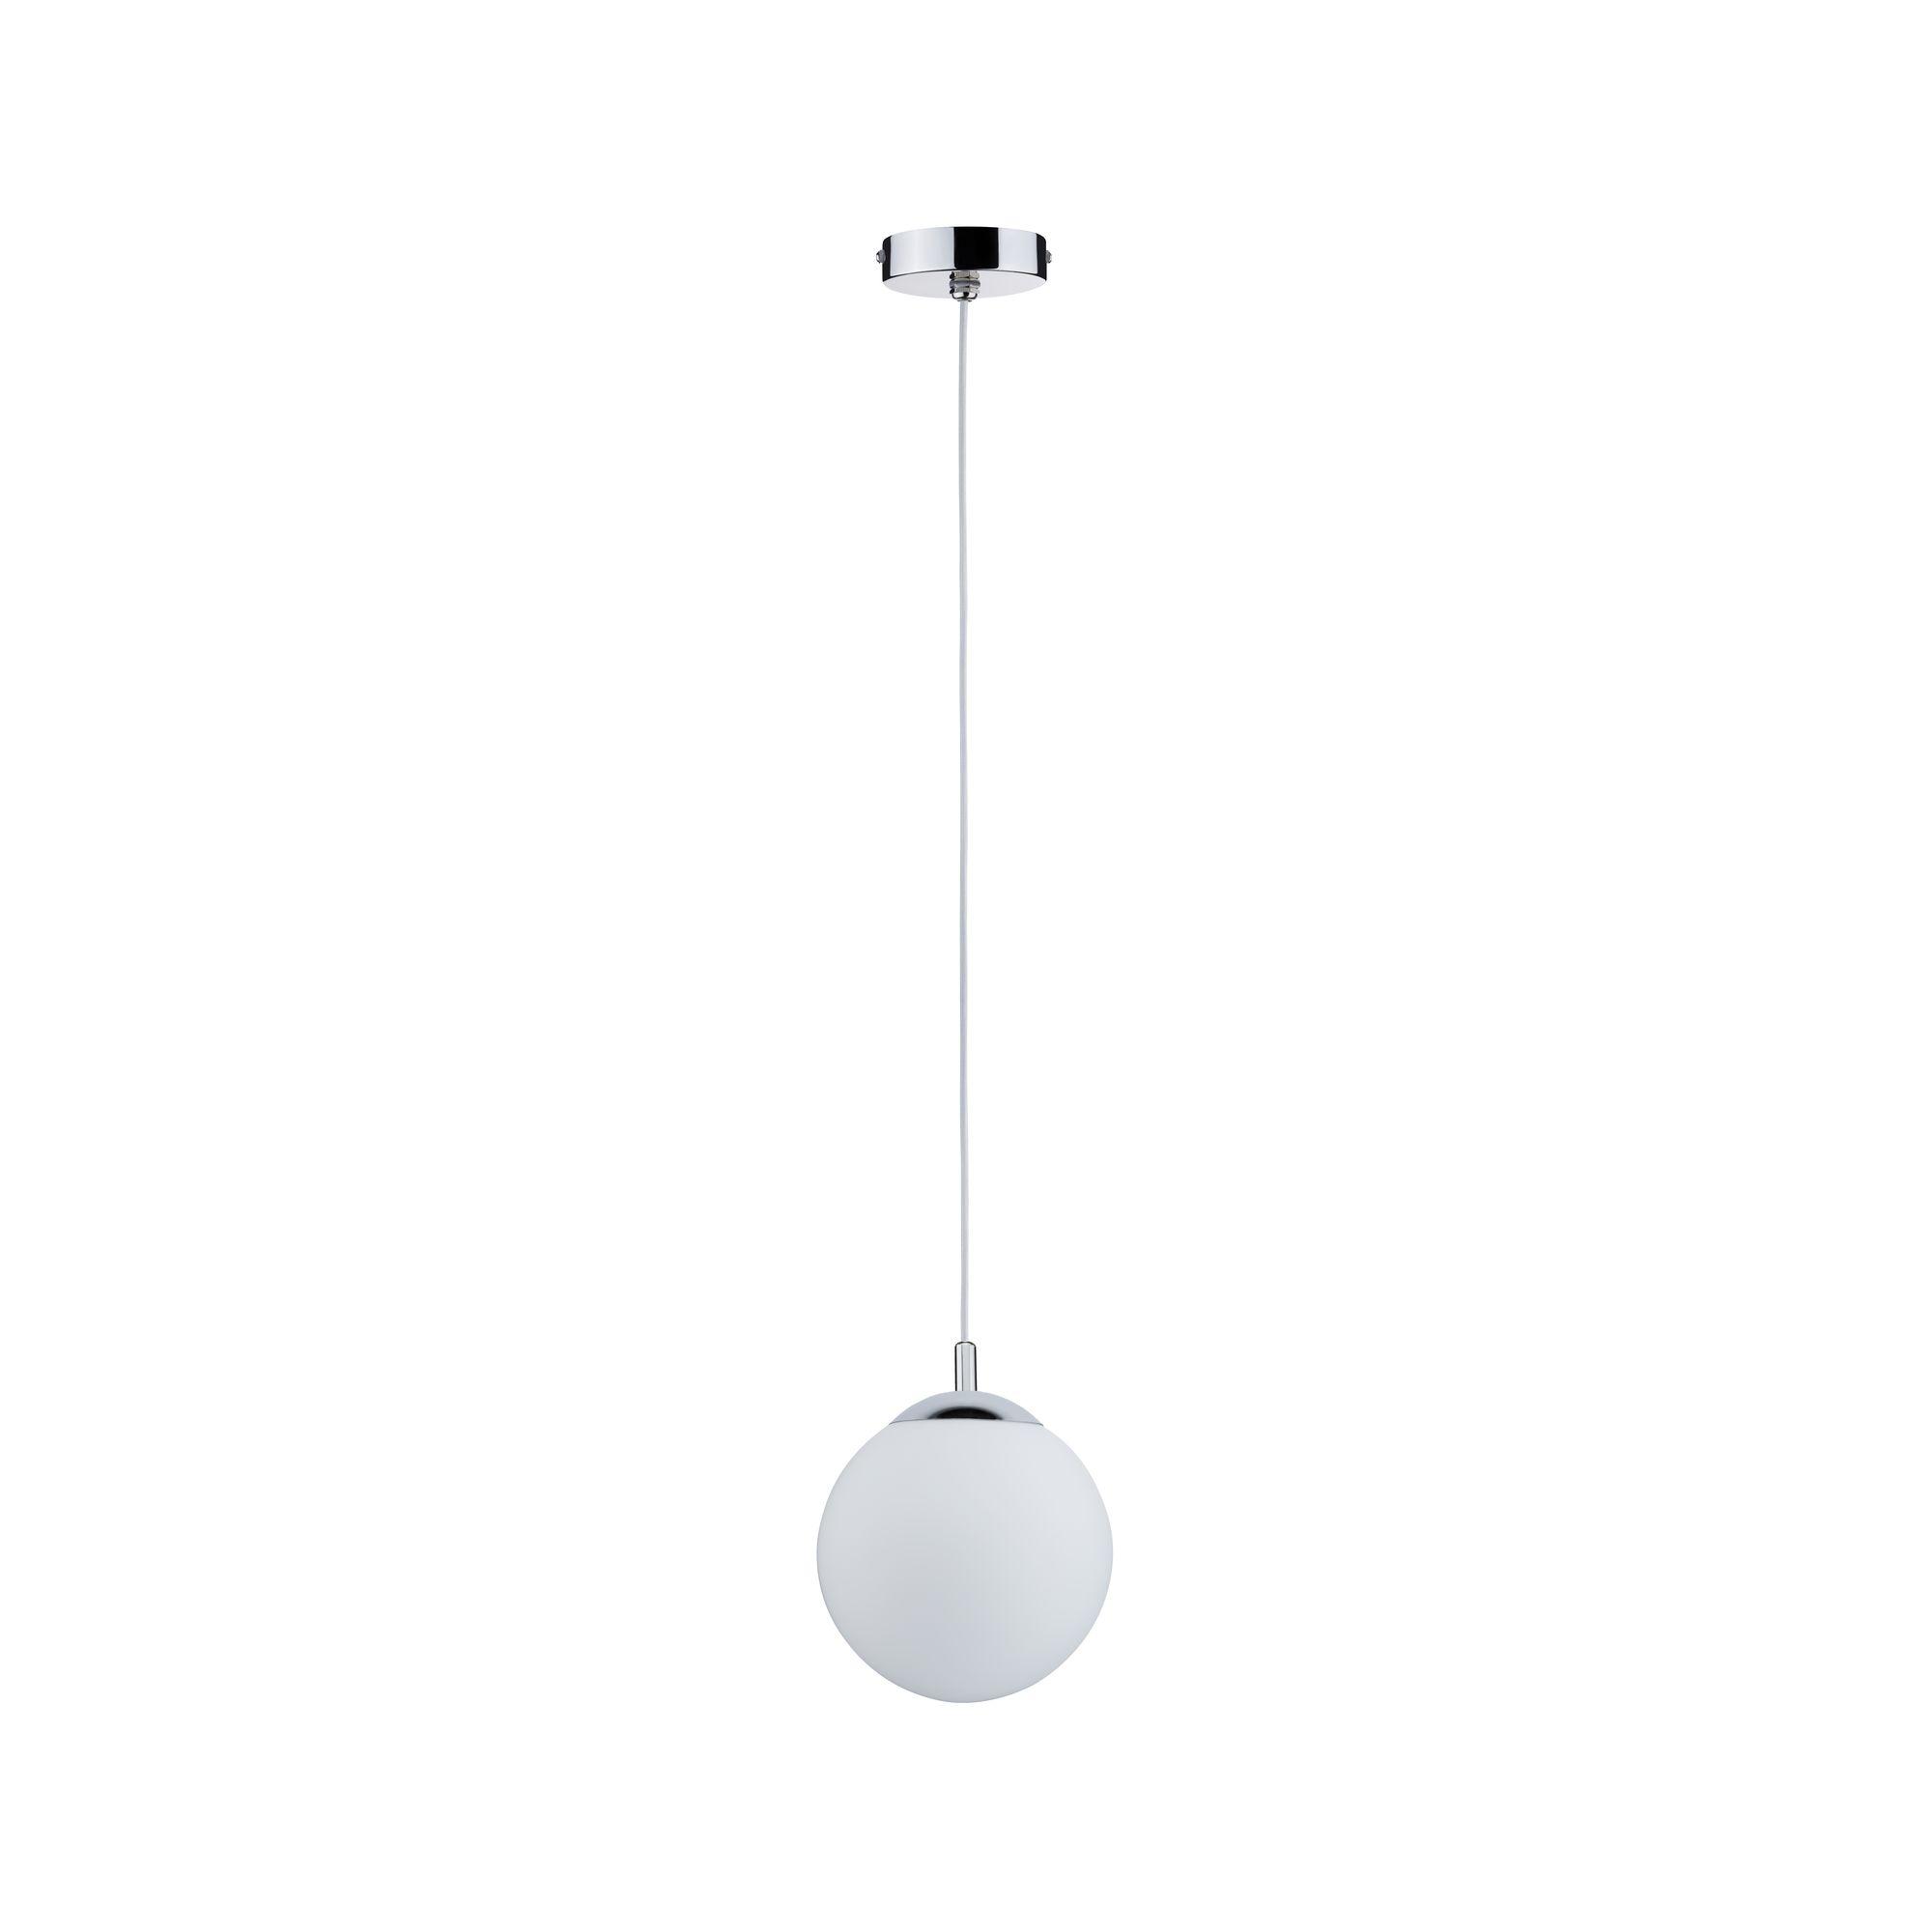 Globe lampa wisząca IP44 E27 708.95 Paulmann